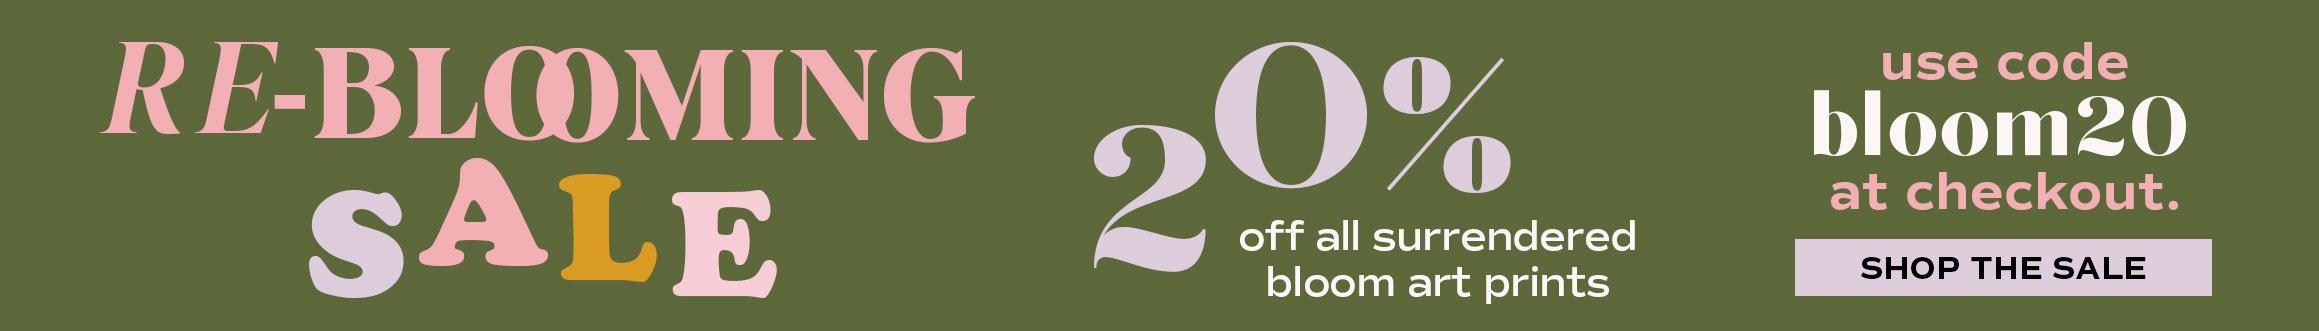 Surrendered Bloom Art Print 20% off Sale